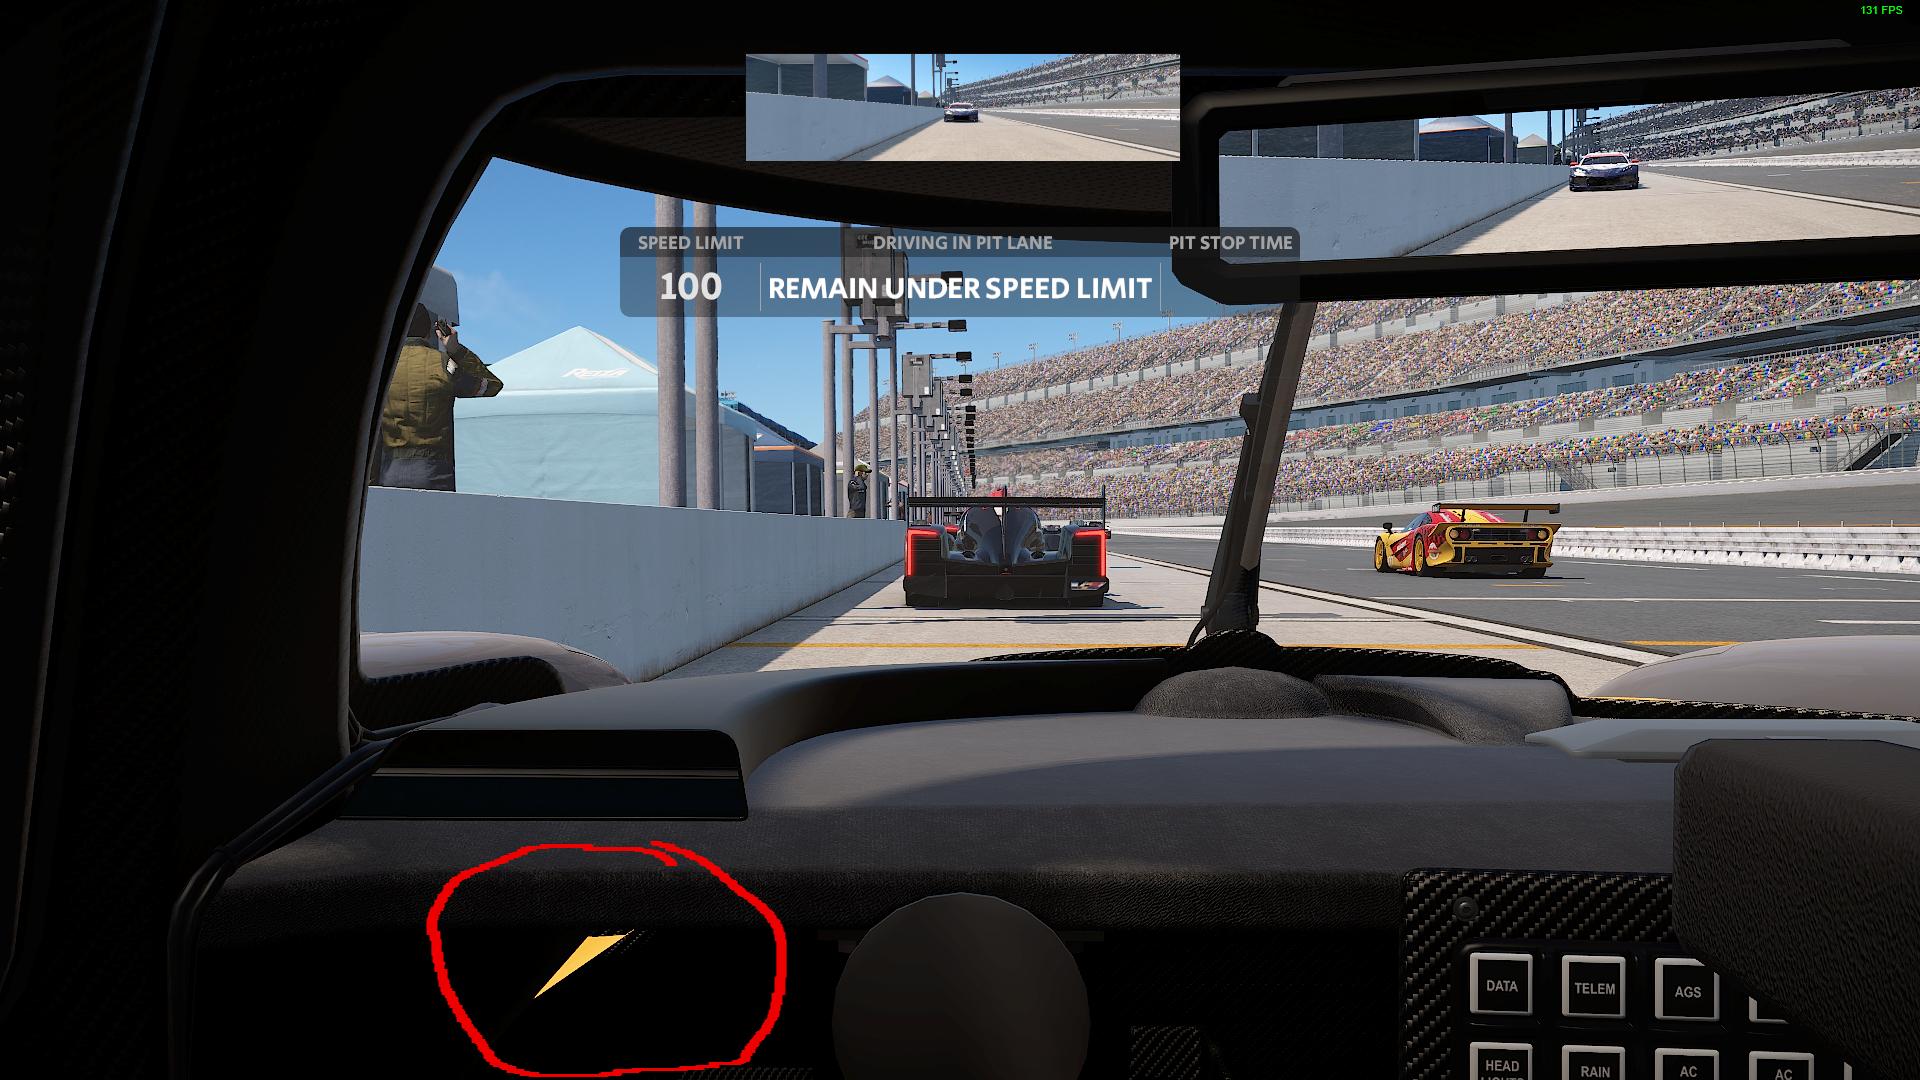 ams2_dpi_cockpit_bug.jpg